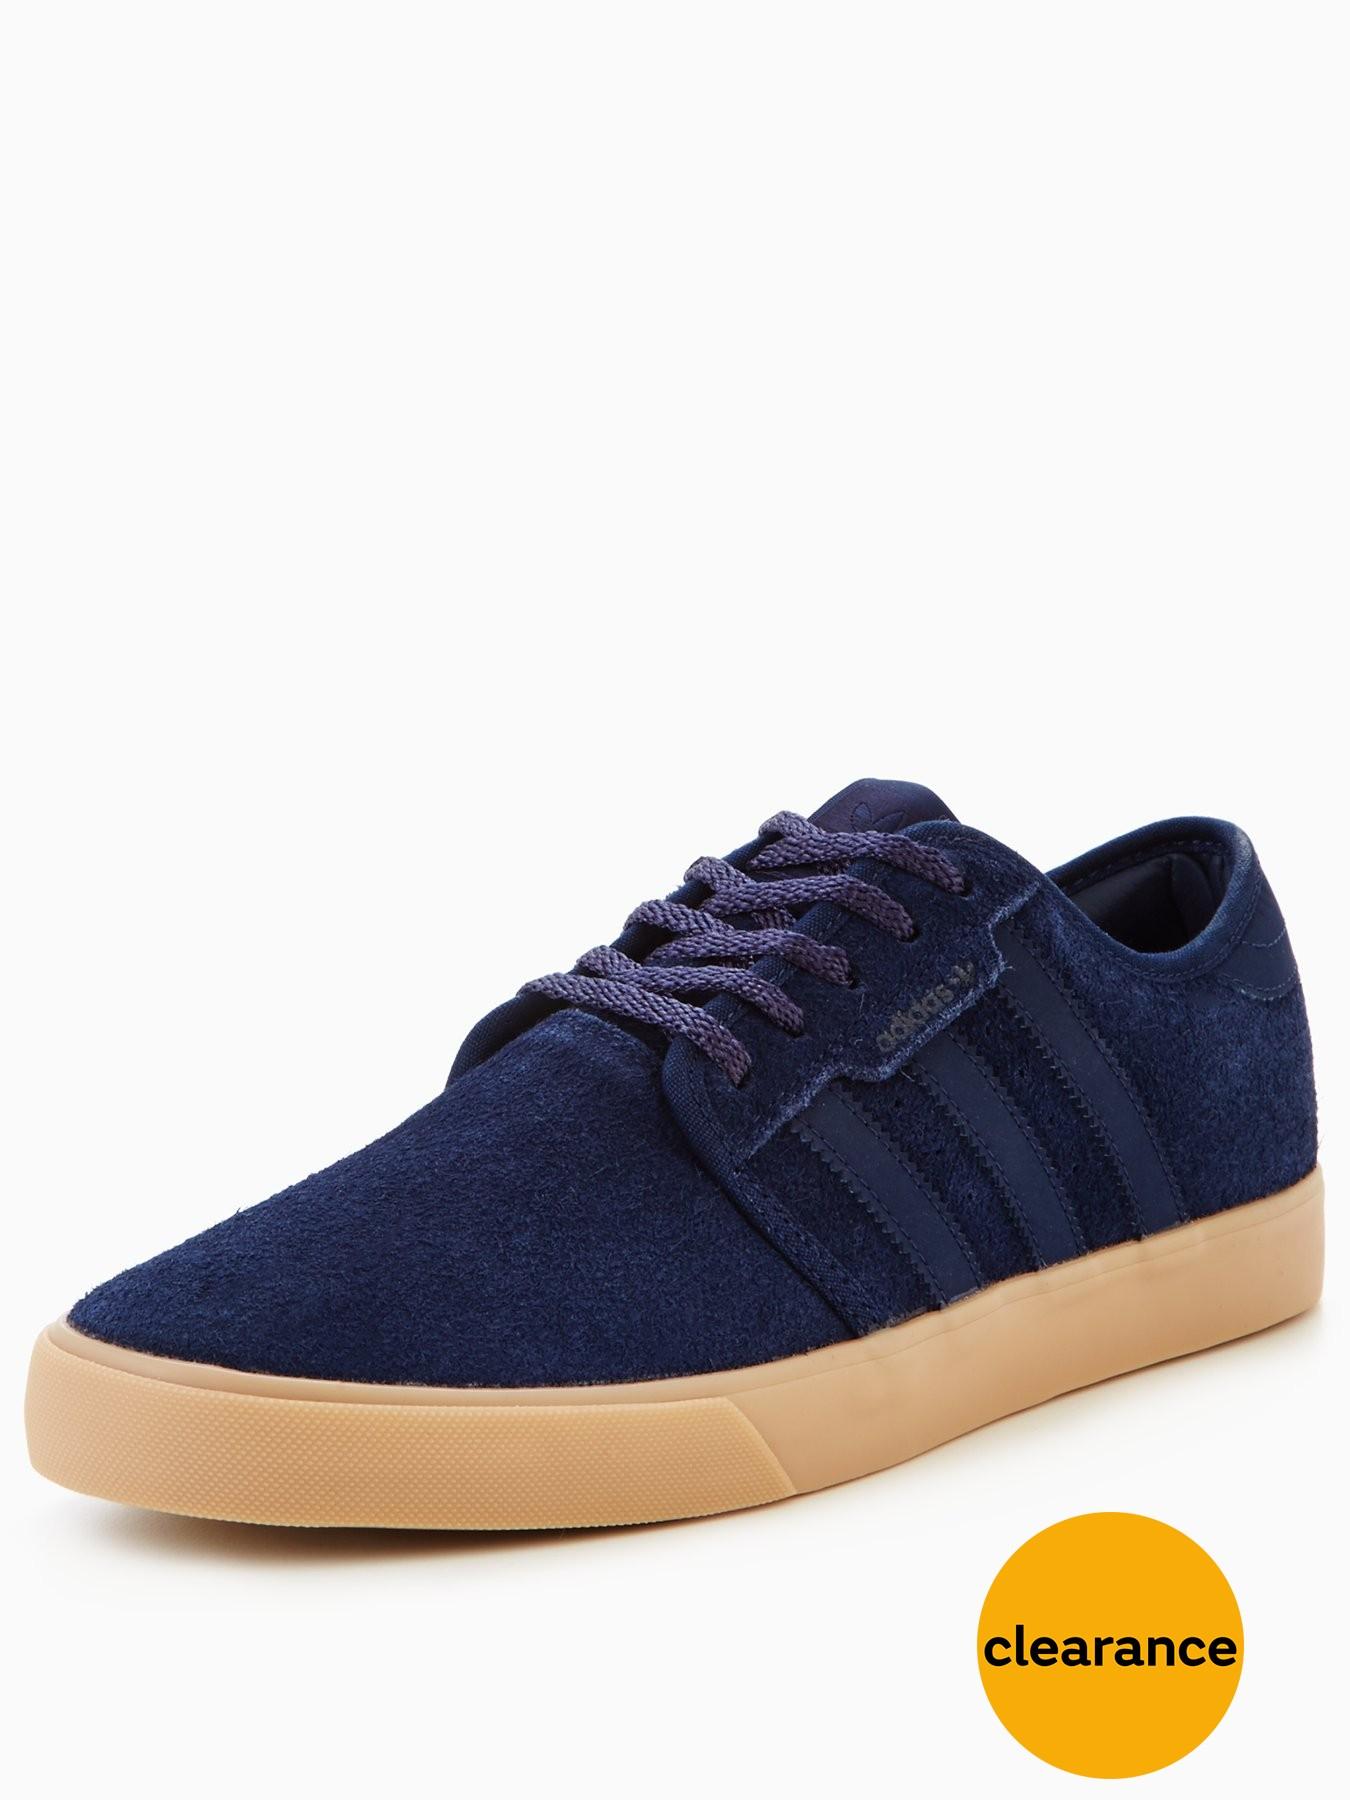 adidas Originals Seeley 1600161614 Men's Shoes adidas Originals Trainers